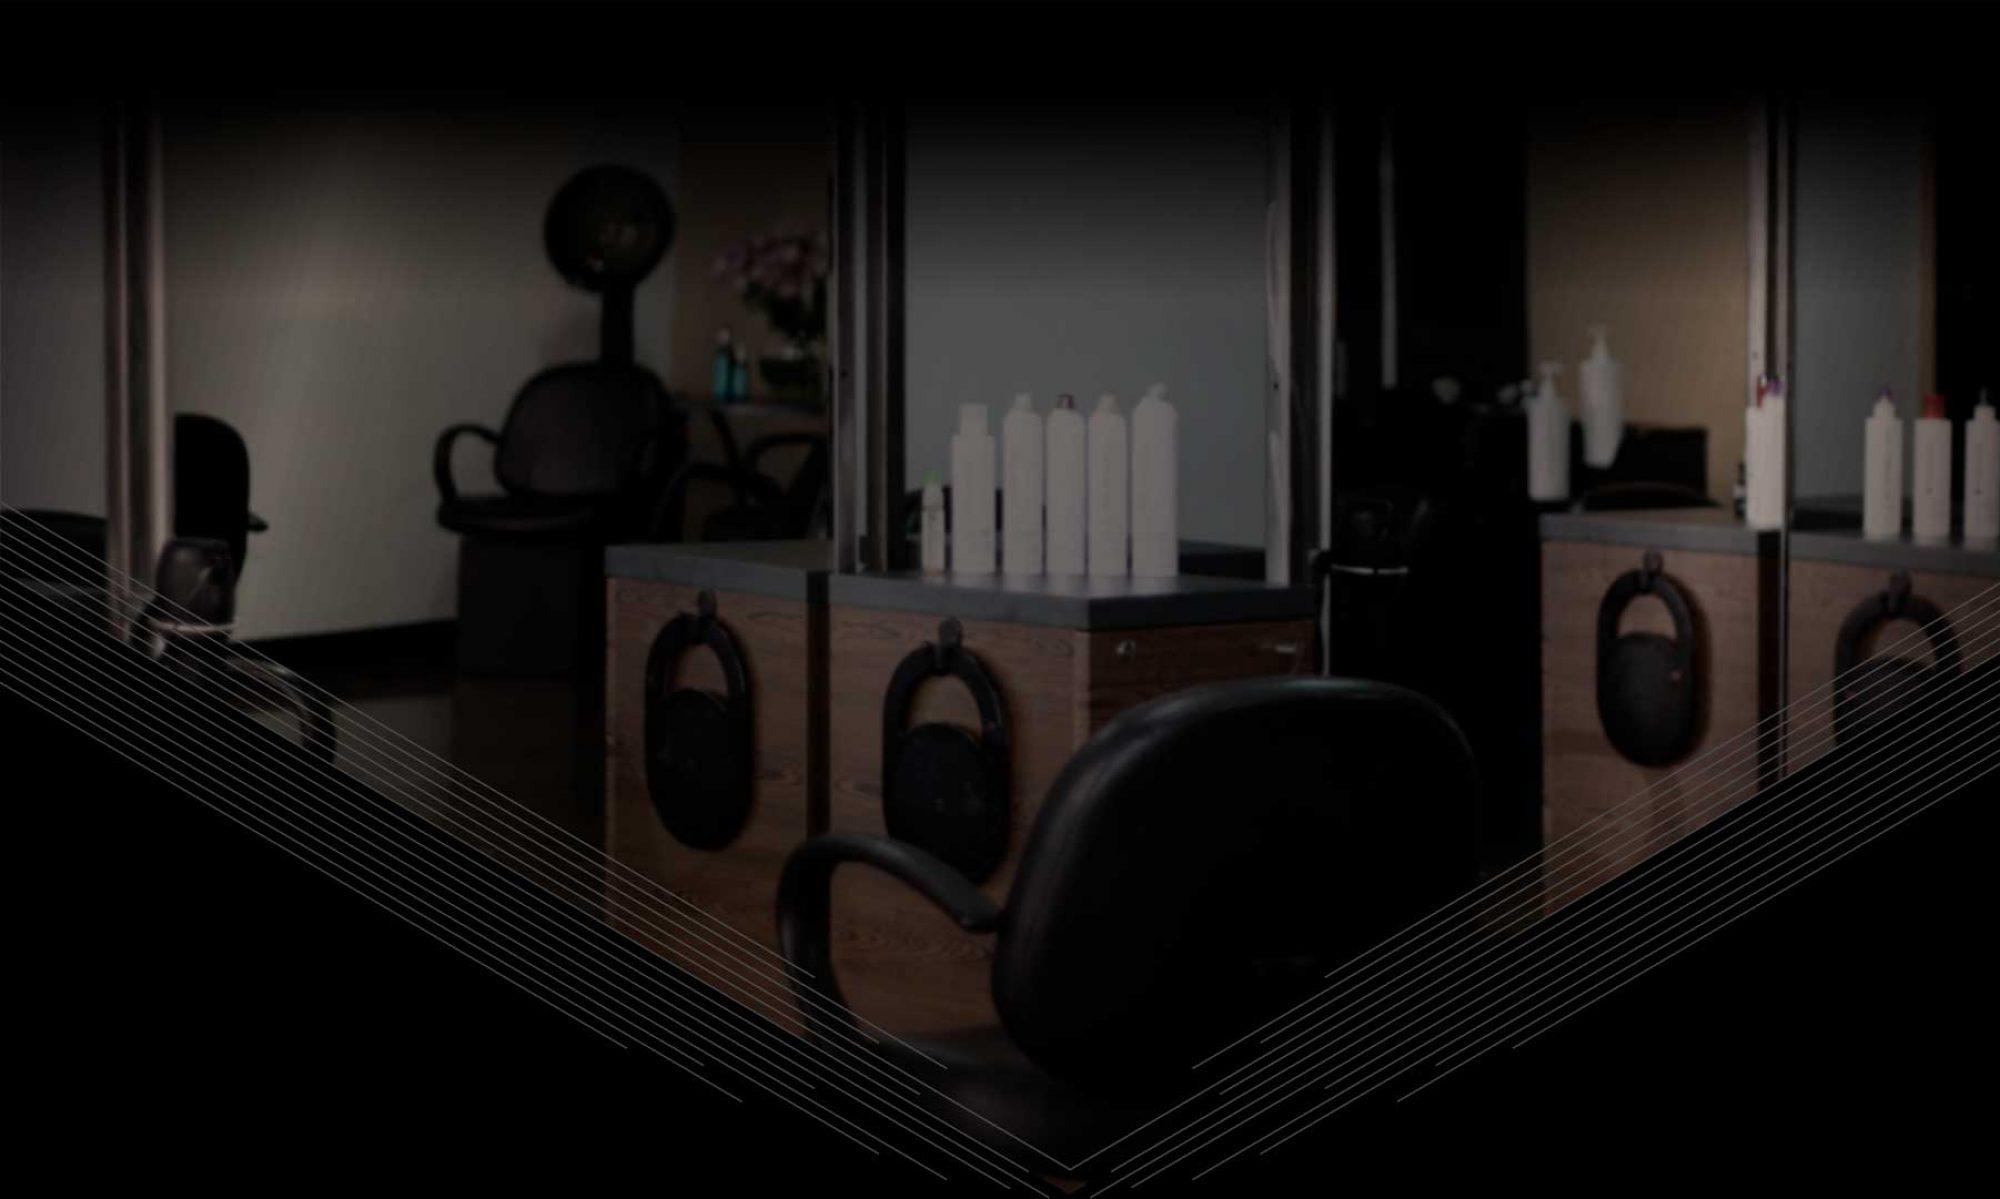 The Salon Corvallis